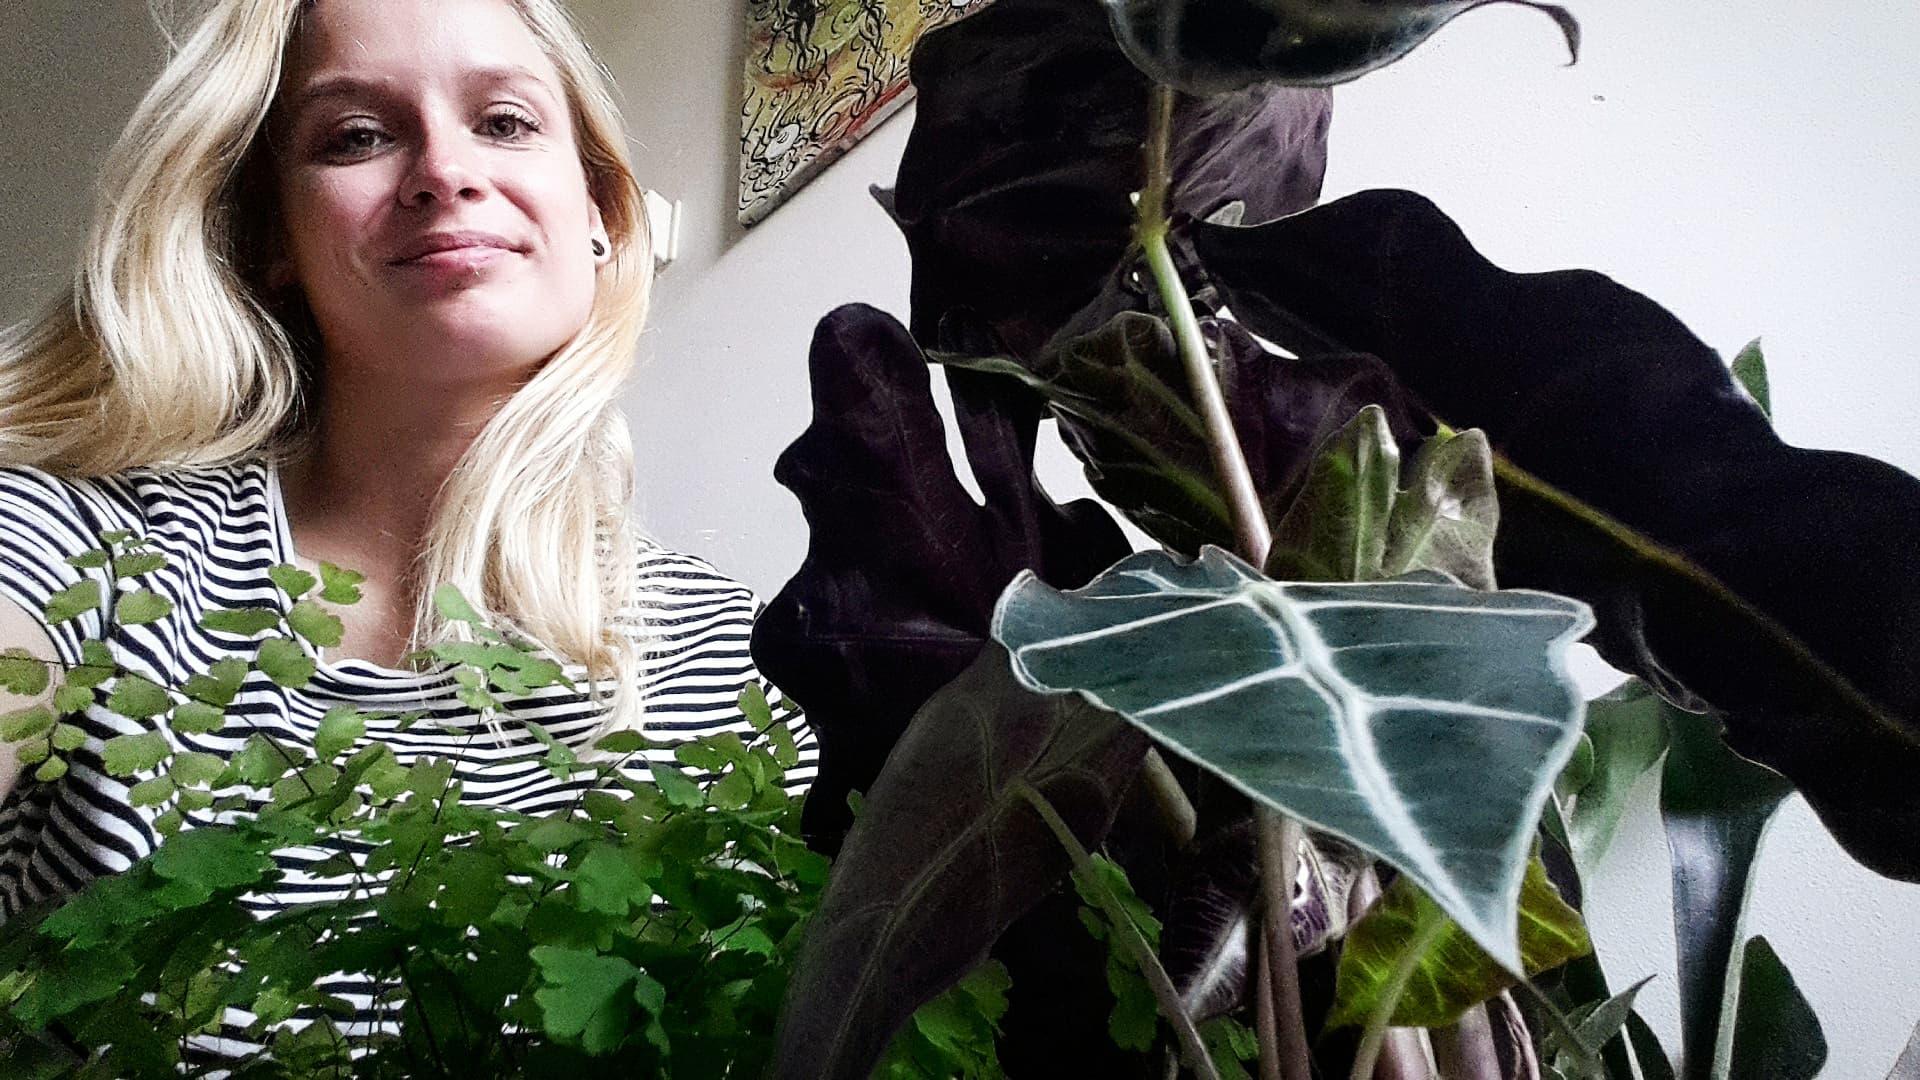 The Gardener without a Garden